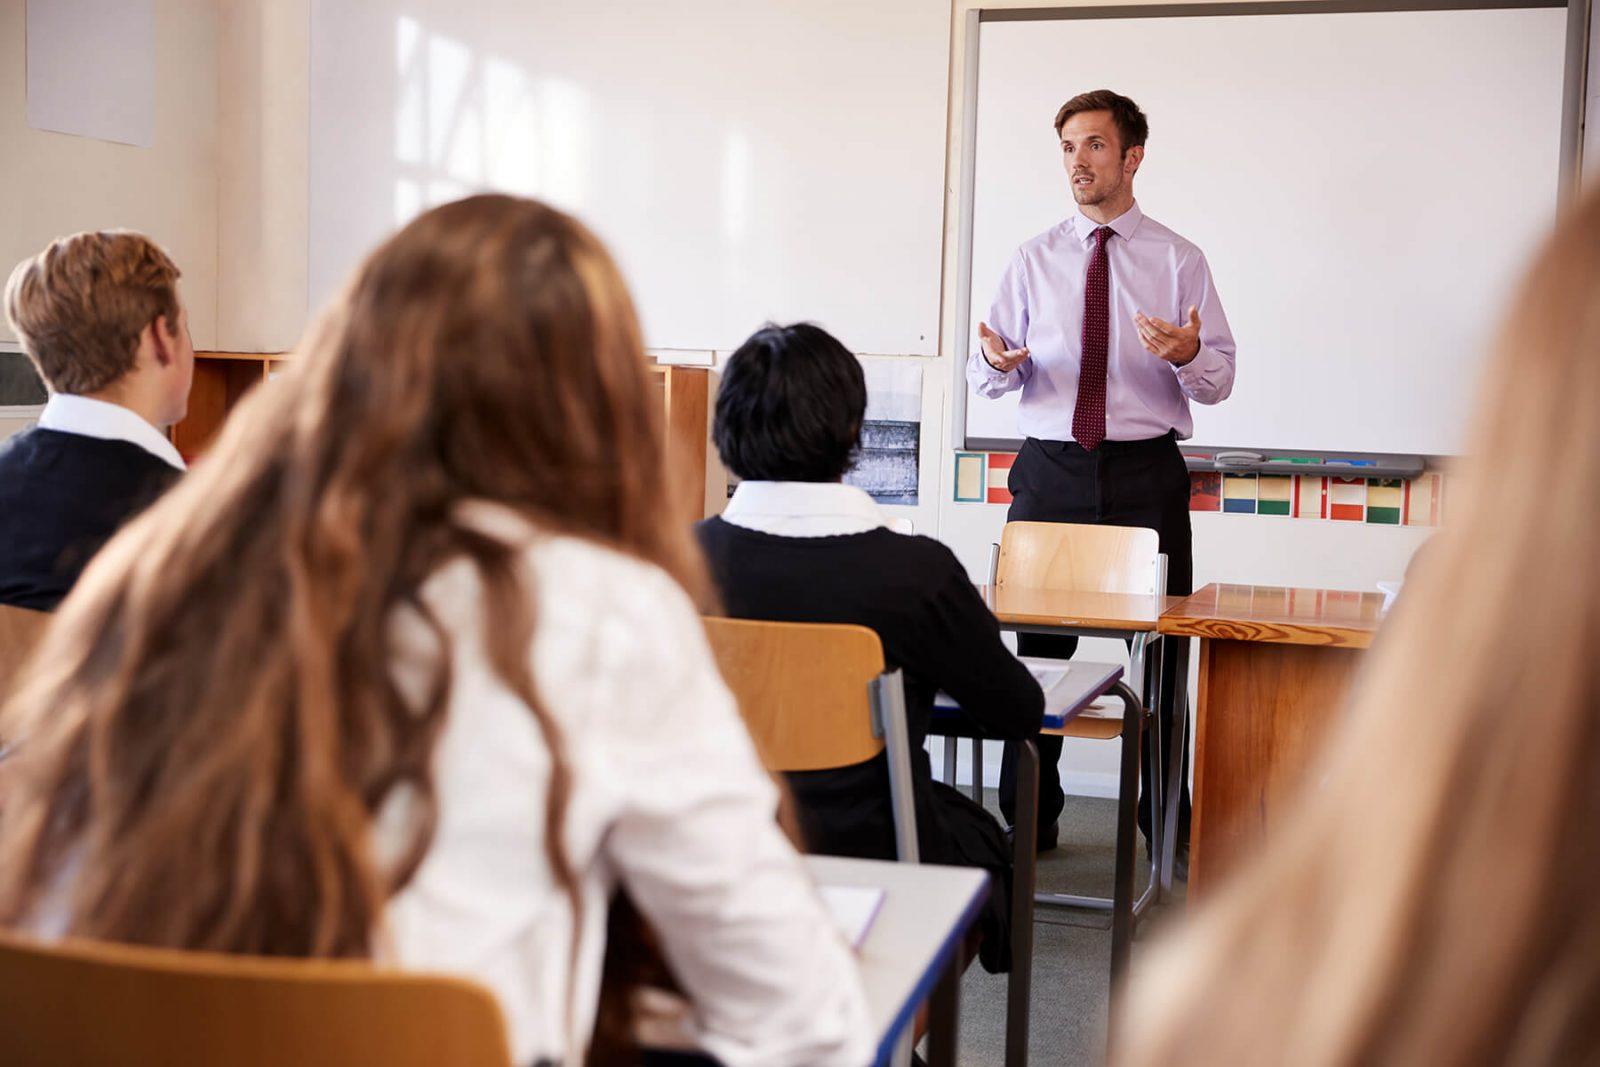 teenage students listening to male teacher